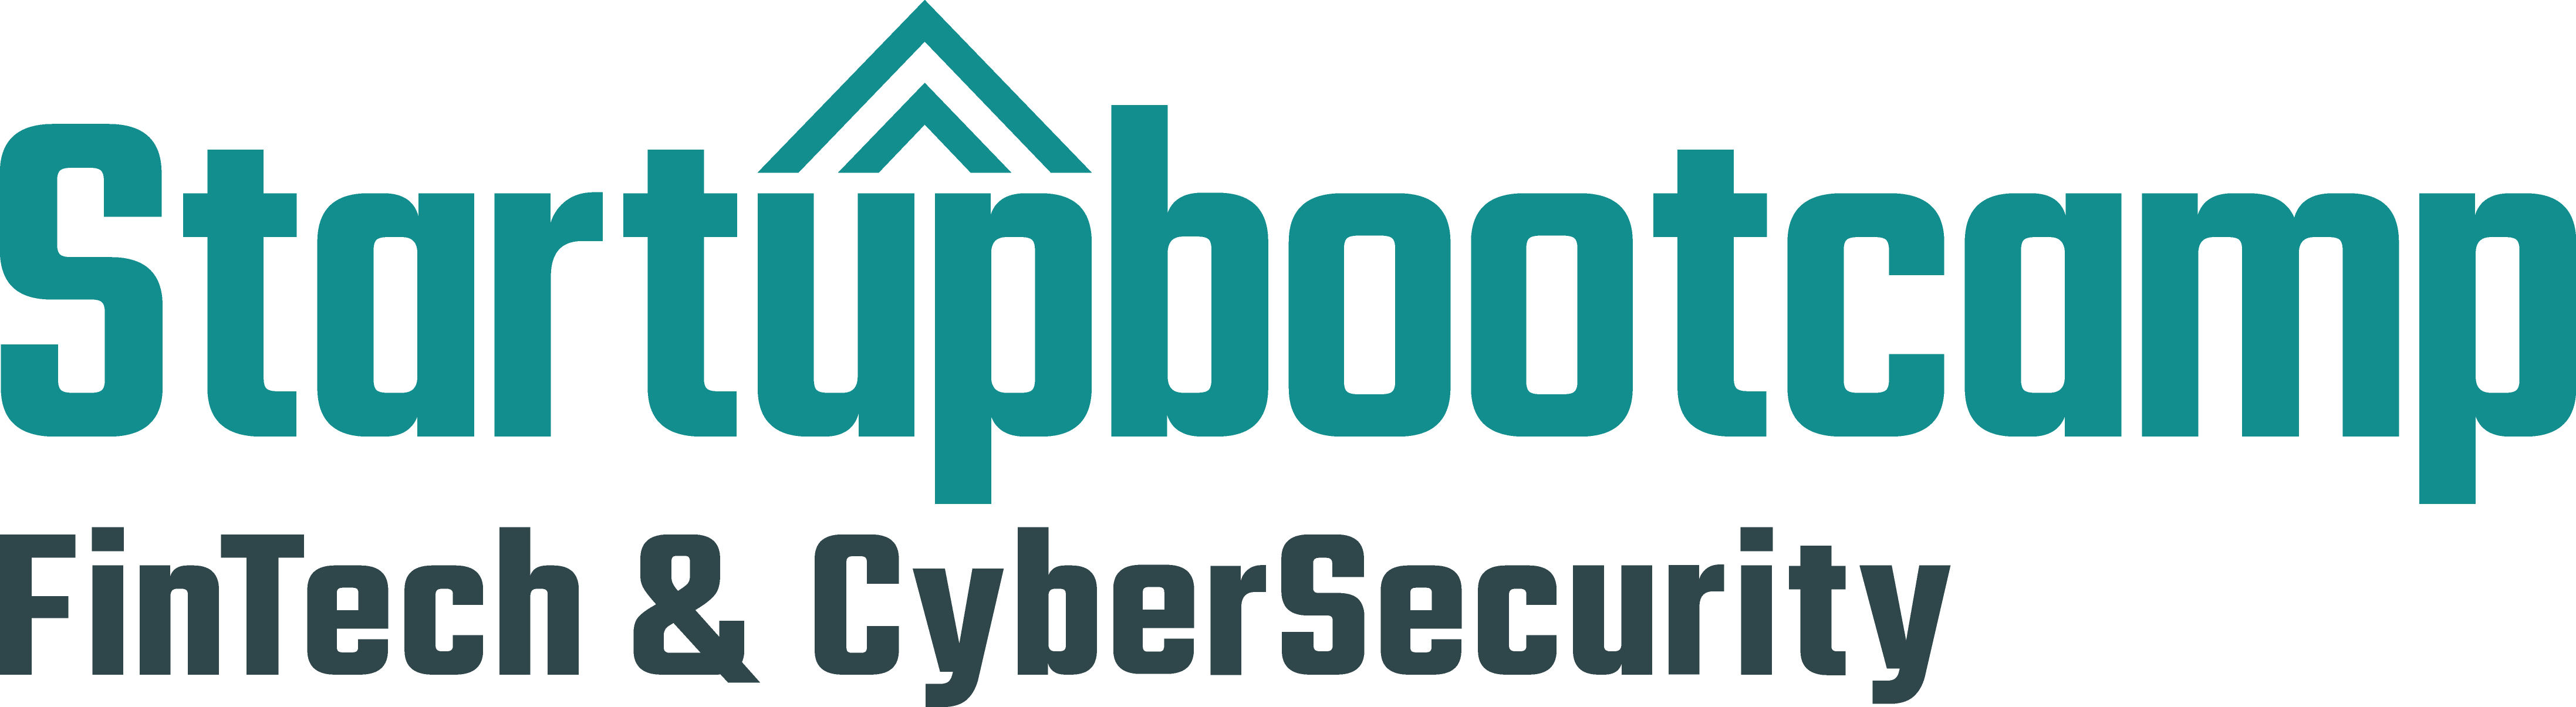 Startupbootcamp FinTech & CyberSecurity